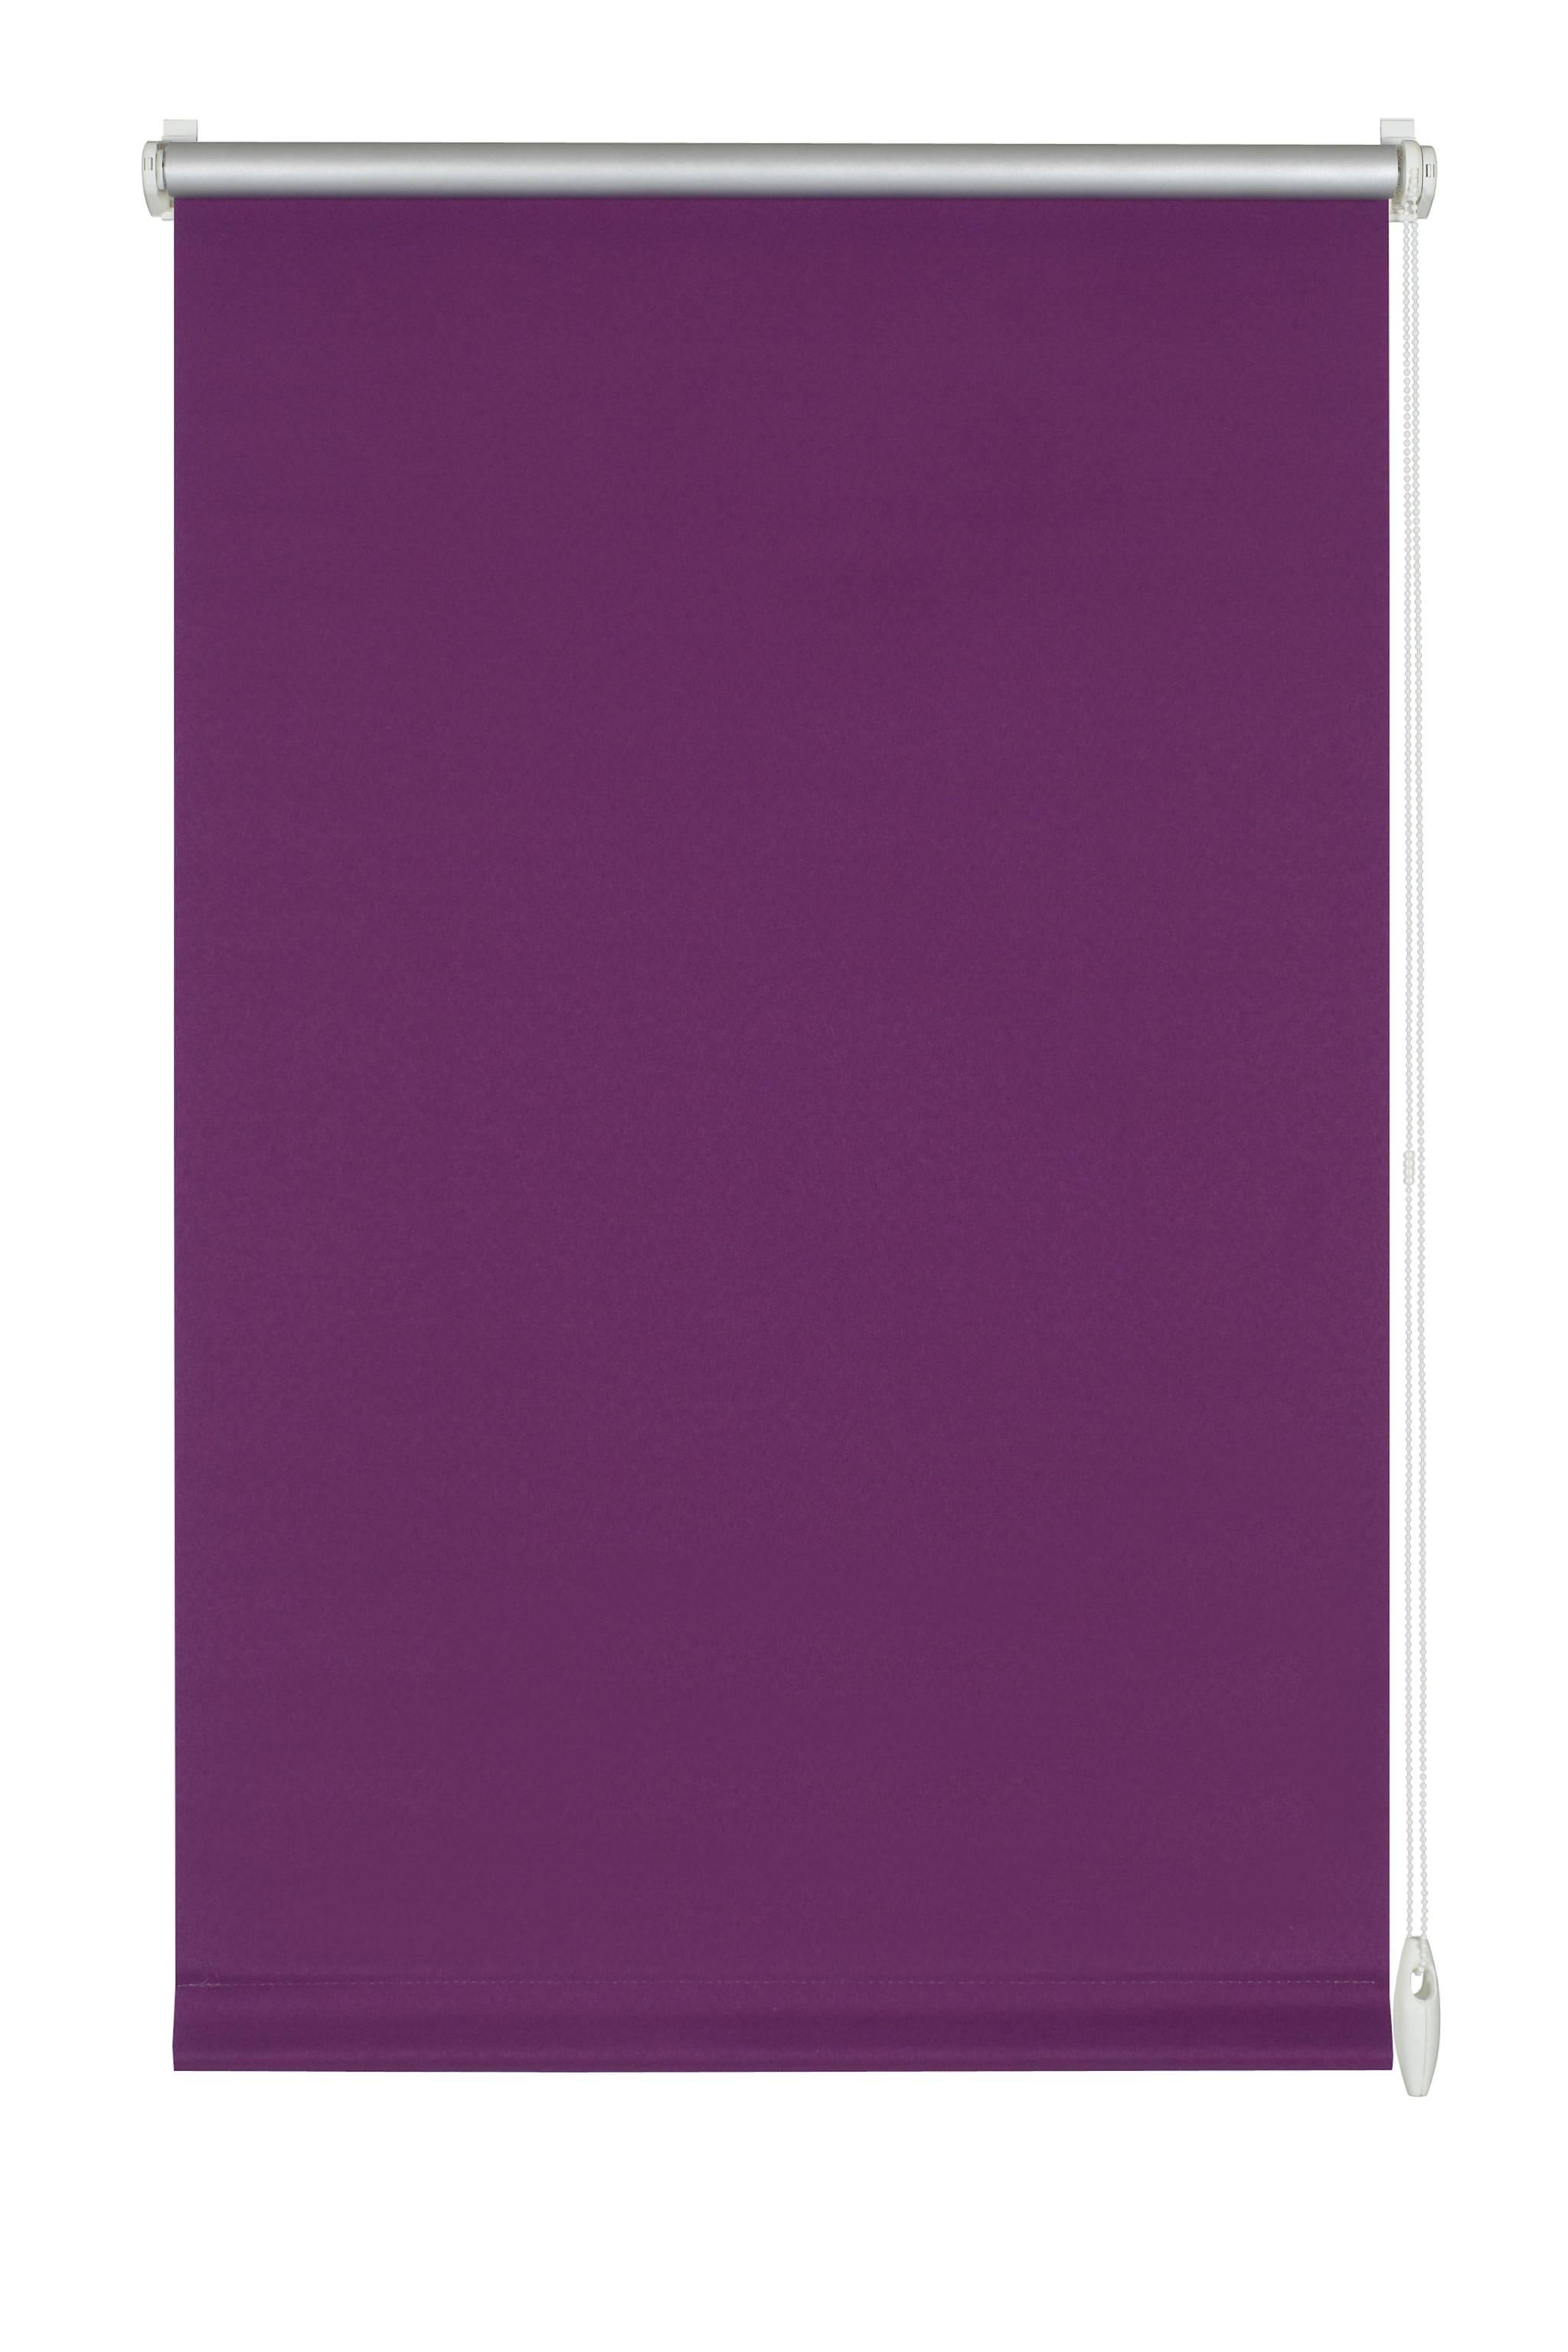 easyfix rollo thermo lila 90 x 210 cm 31547. Black Bedroom Furniture Sets. Home Design Ideas